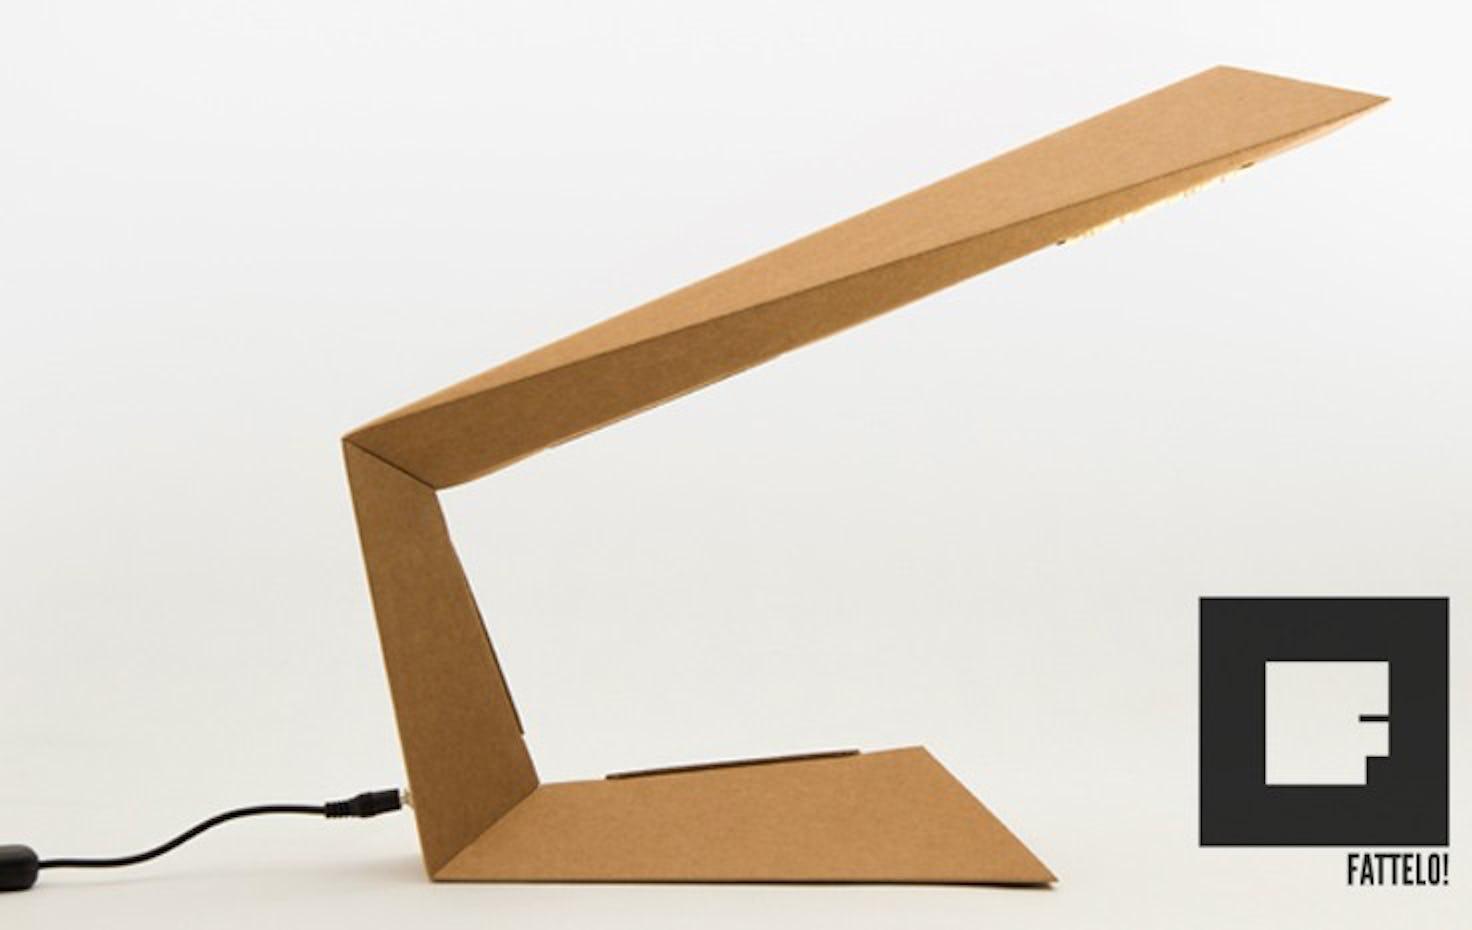 Lampada In Cartone 01lamp : Fattelo in crowdfunding su eppela